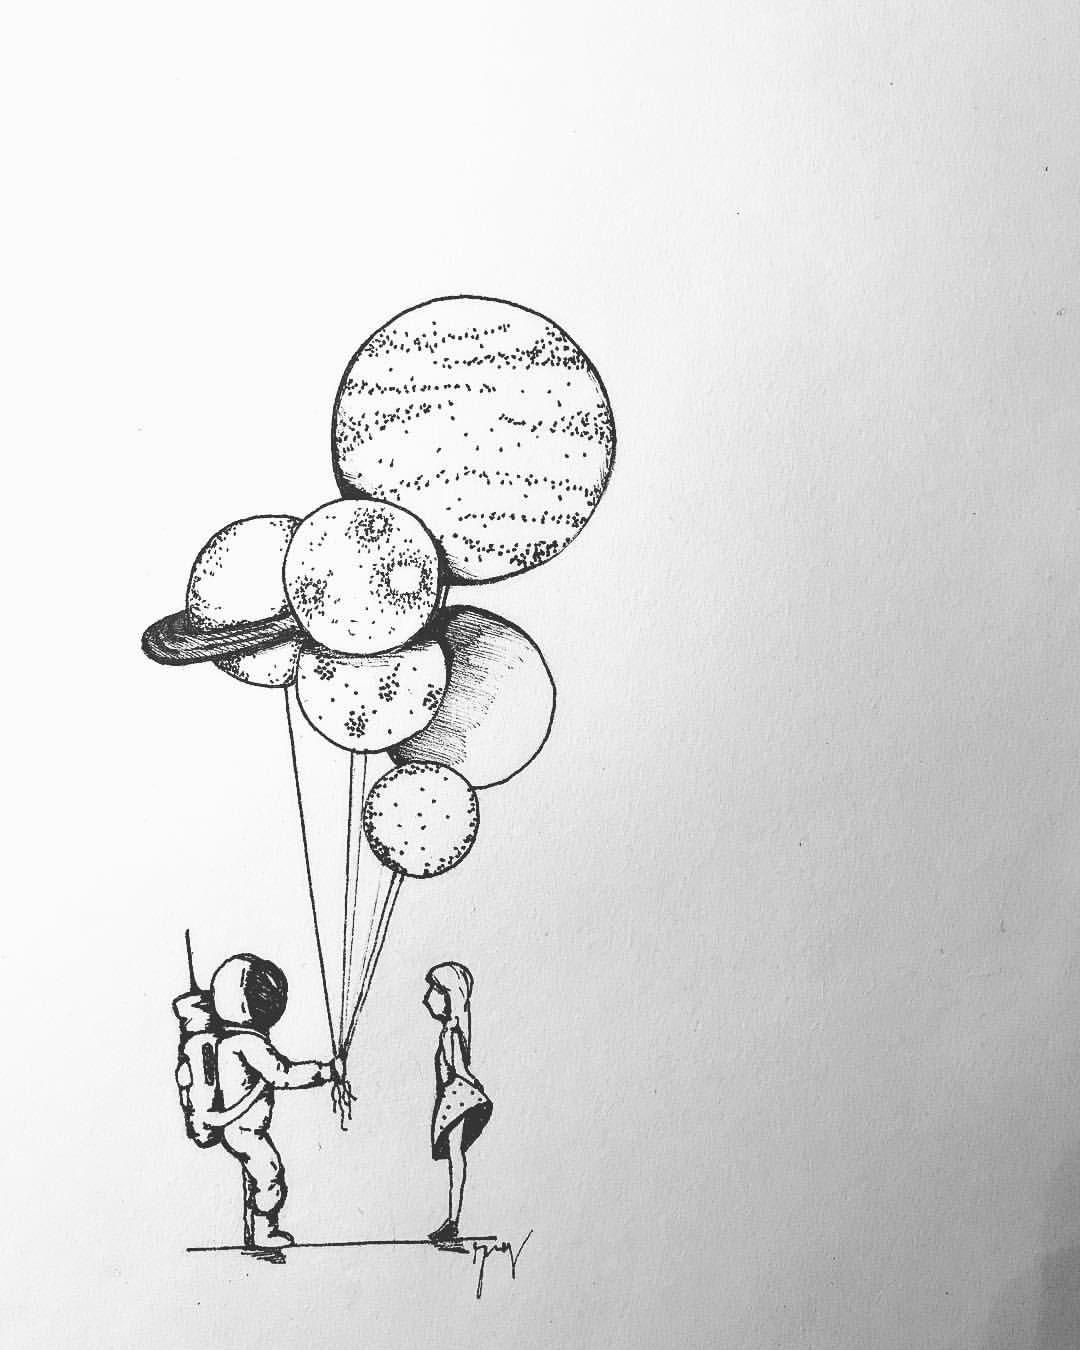 Houston, m'arrangio? 🌔 • • • • • • • #draw #paint #planets ...